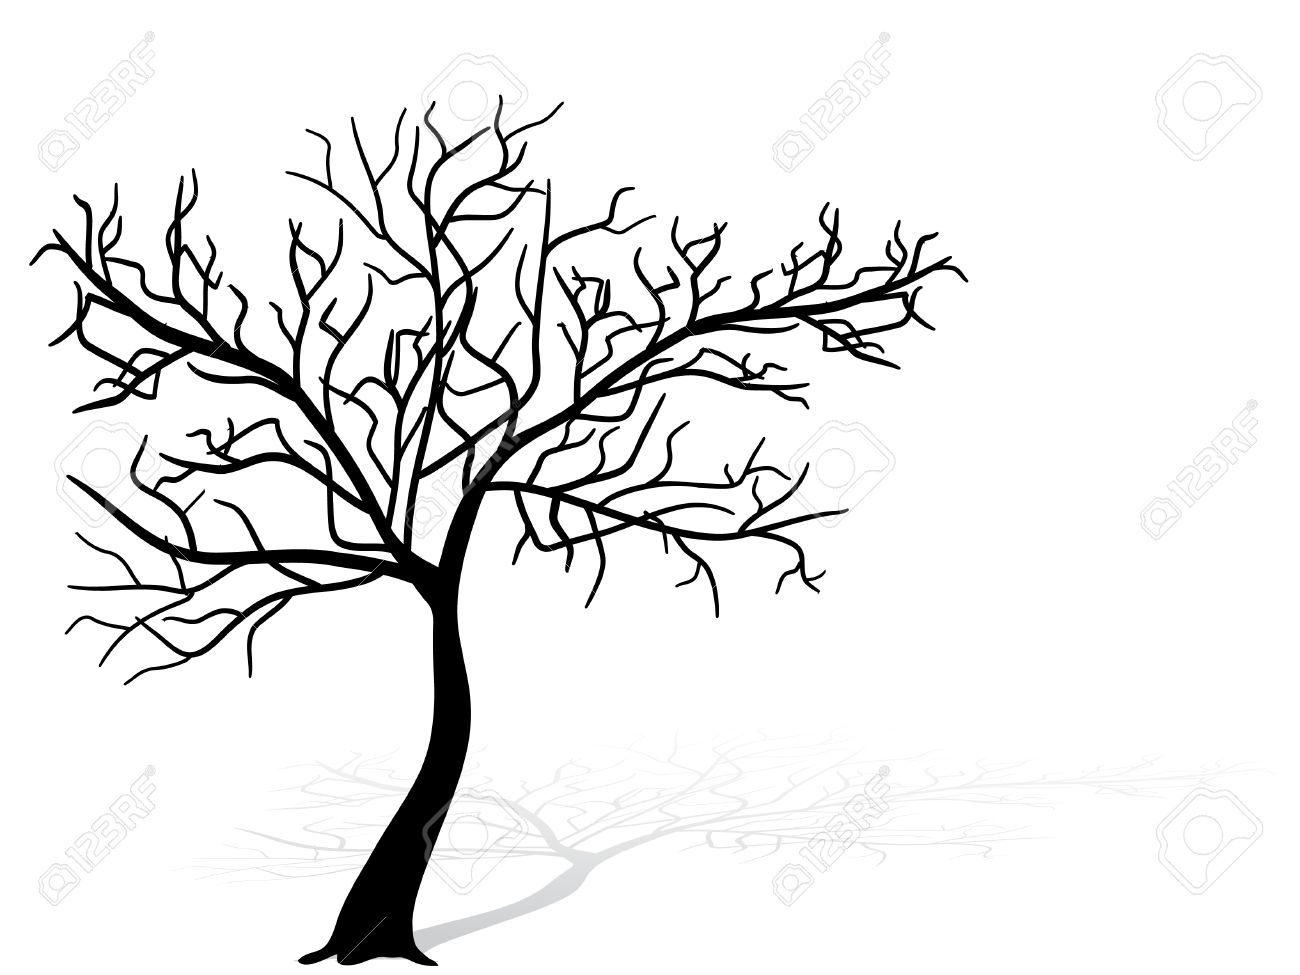 1300x975 Clip Art Black Tree Silhouette Tree Cherry Blossom 7tbeaul